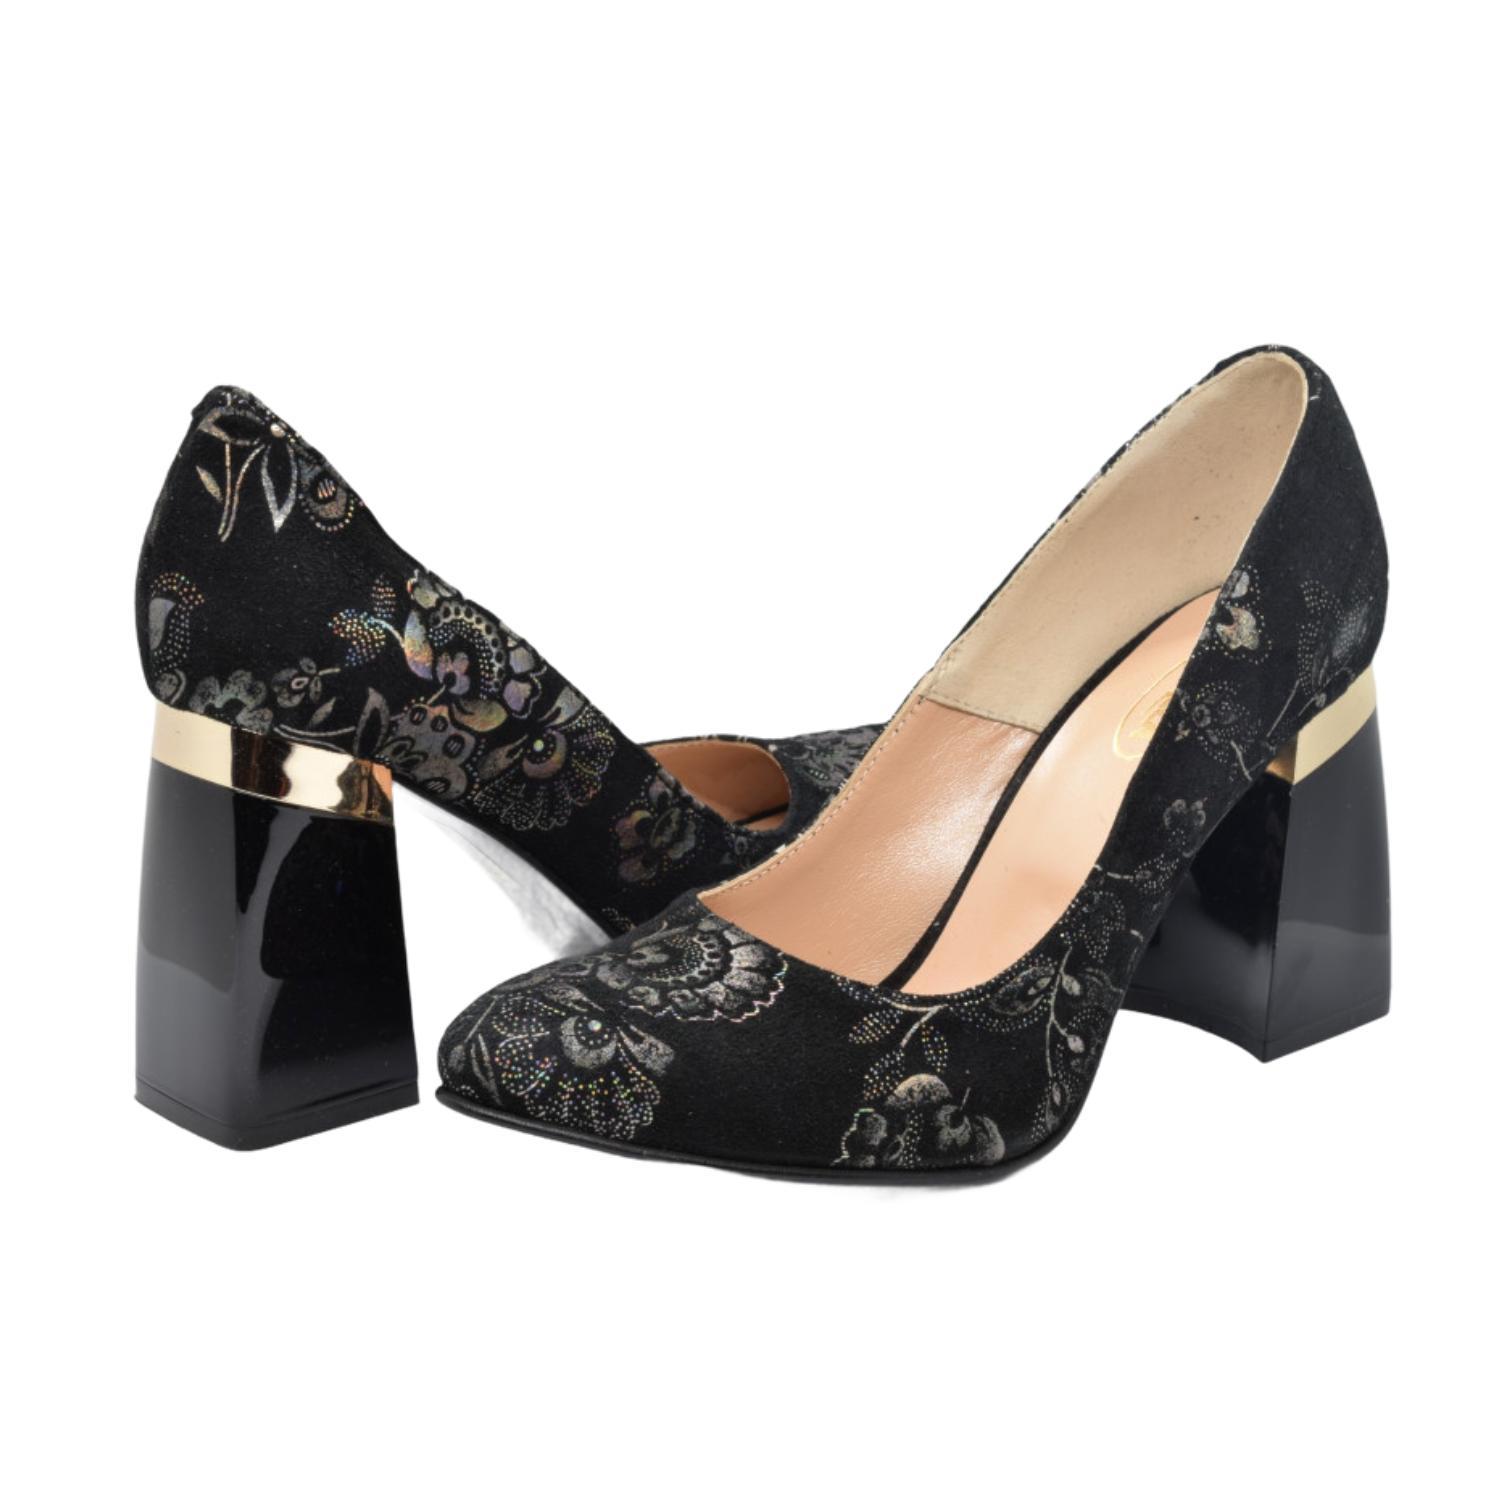 Pantofi negri cu imprimeu floral argintiu si toc evazat